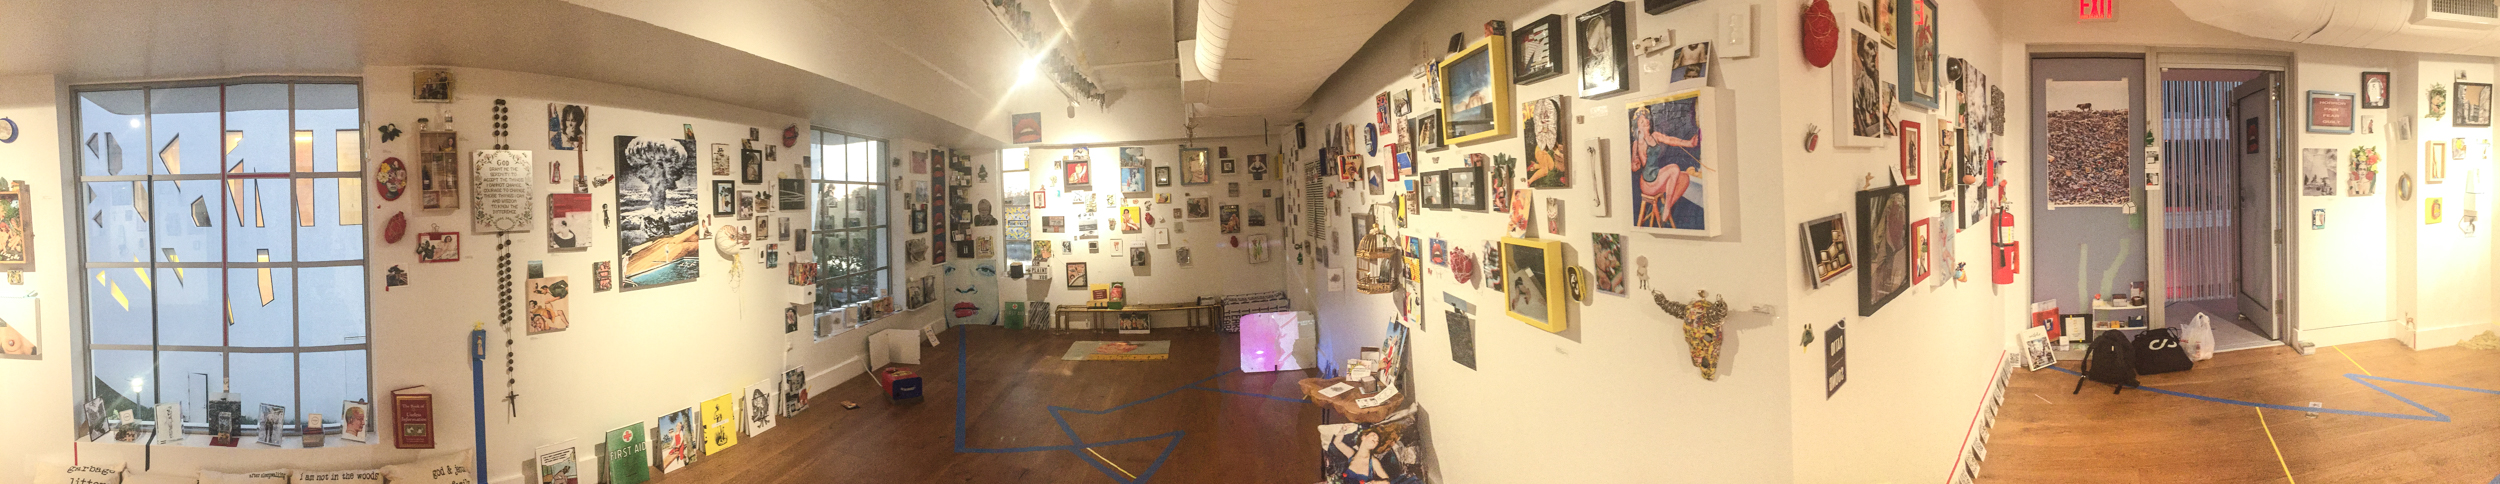 Faena-Exhibition-Images-7.jpg